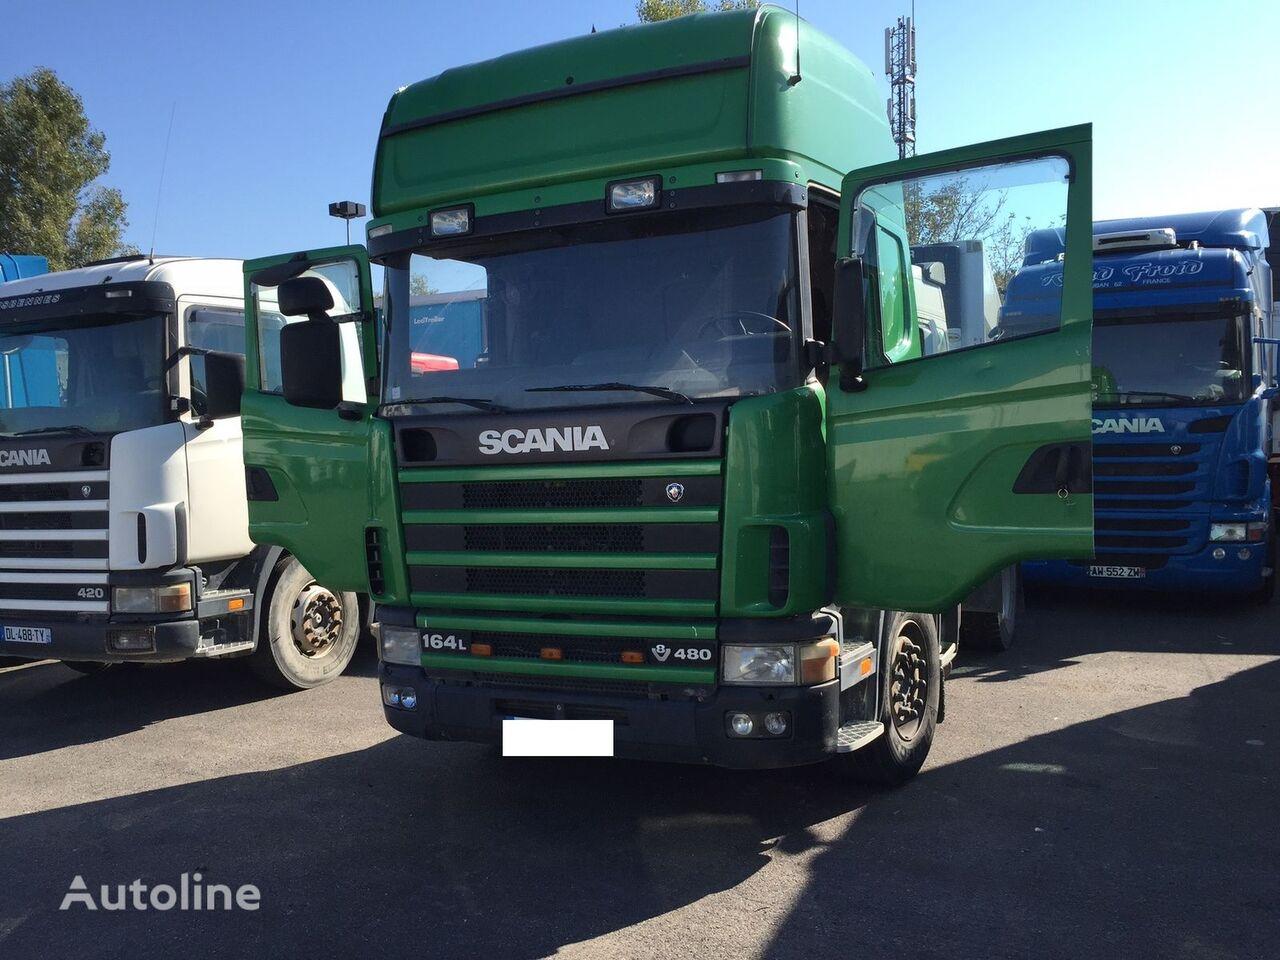 SCANIA 164 L 480CH tractor unit